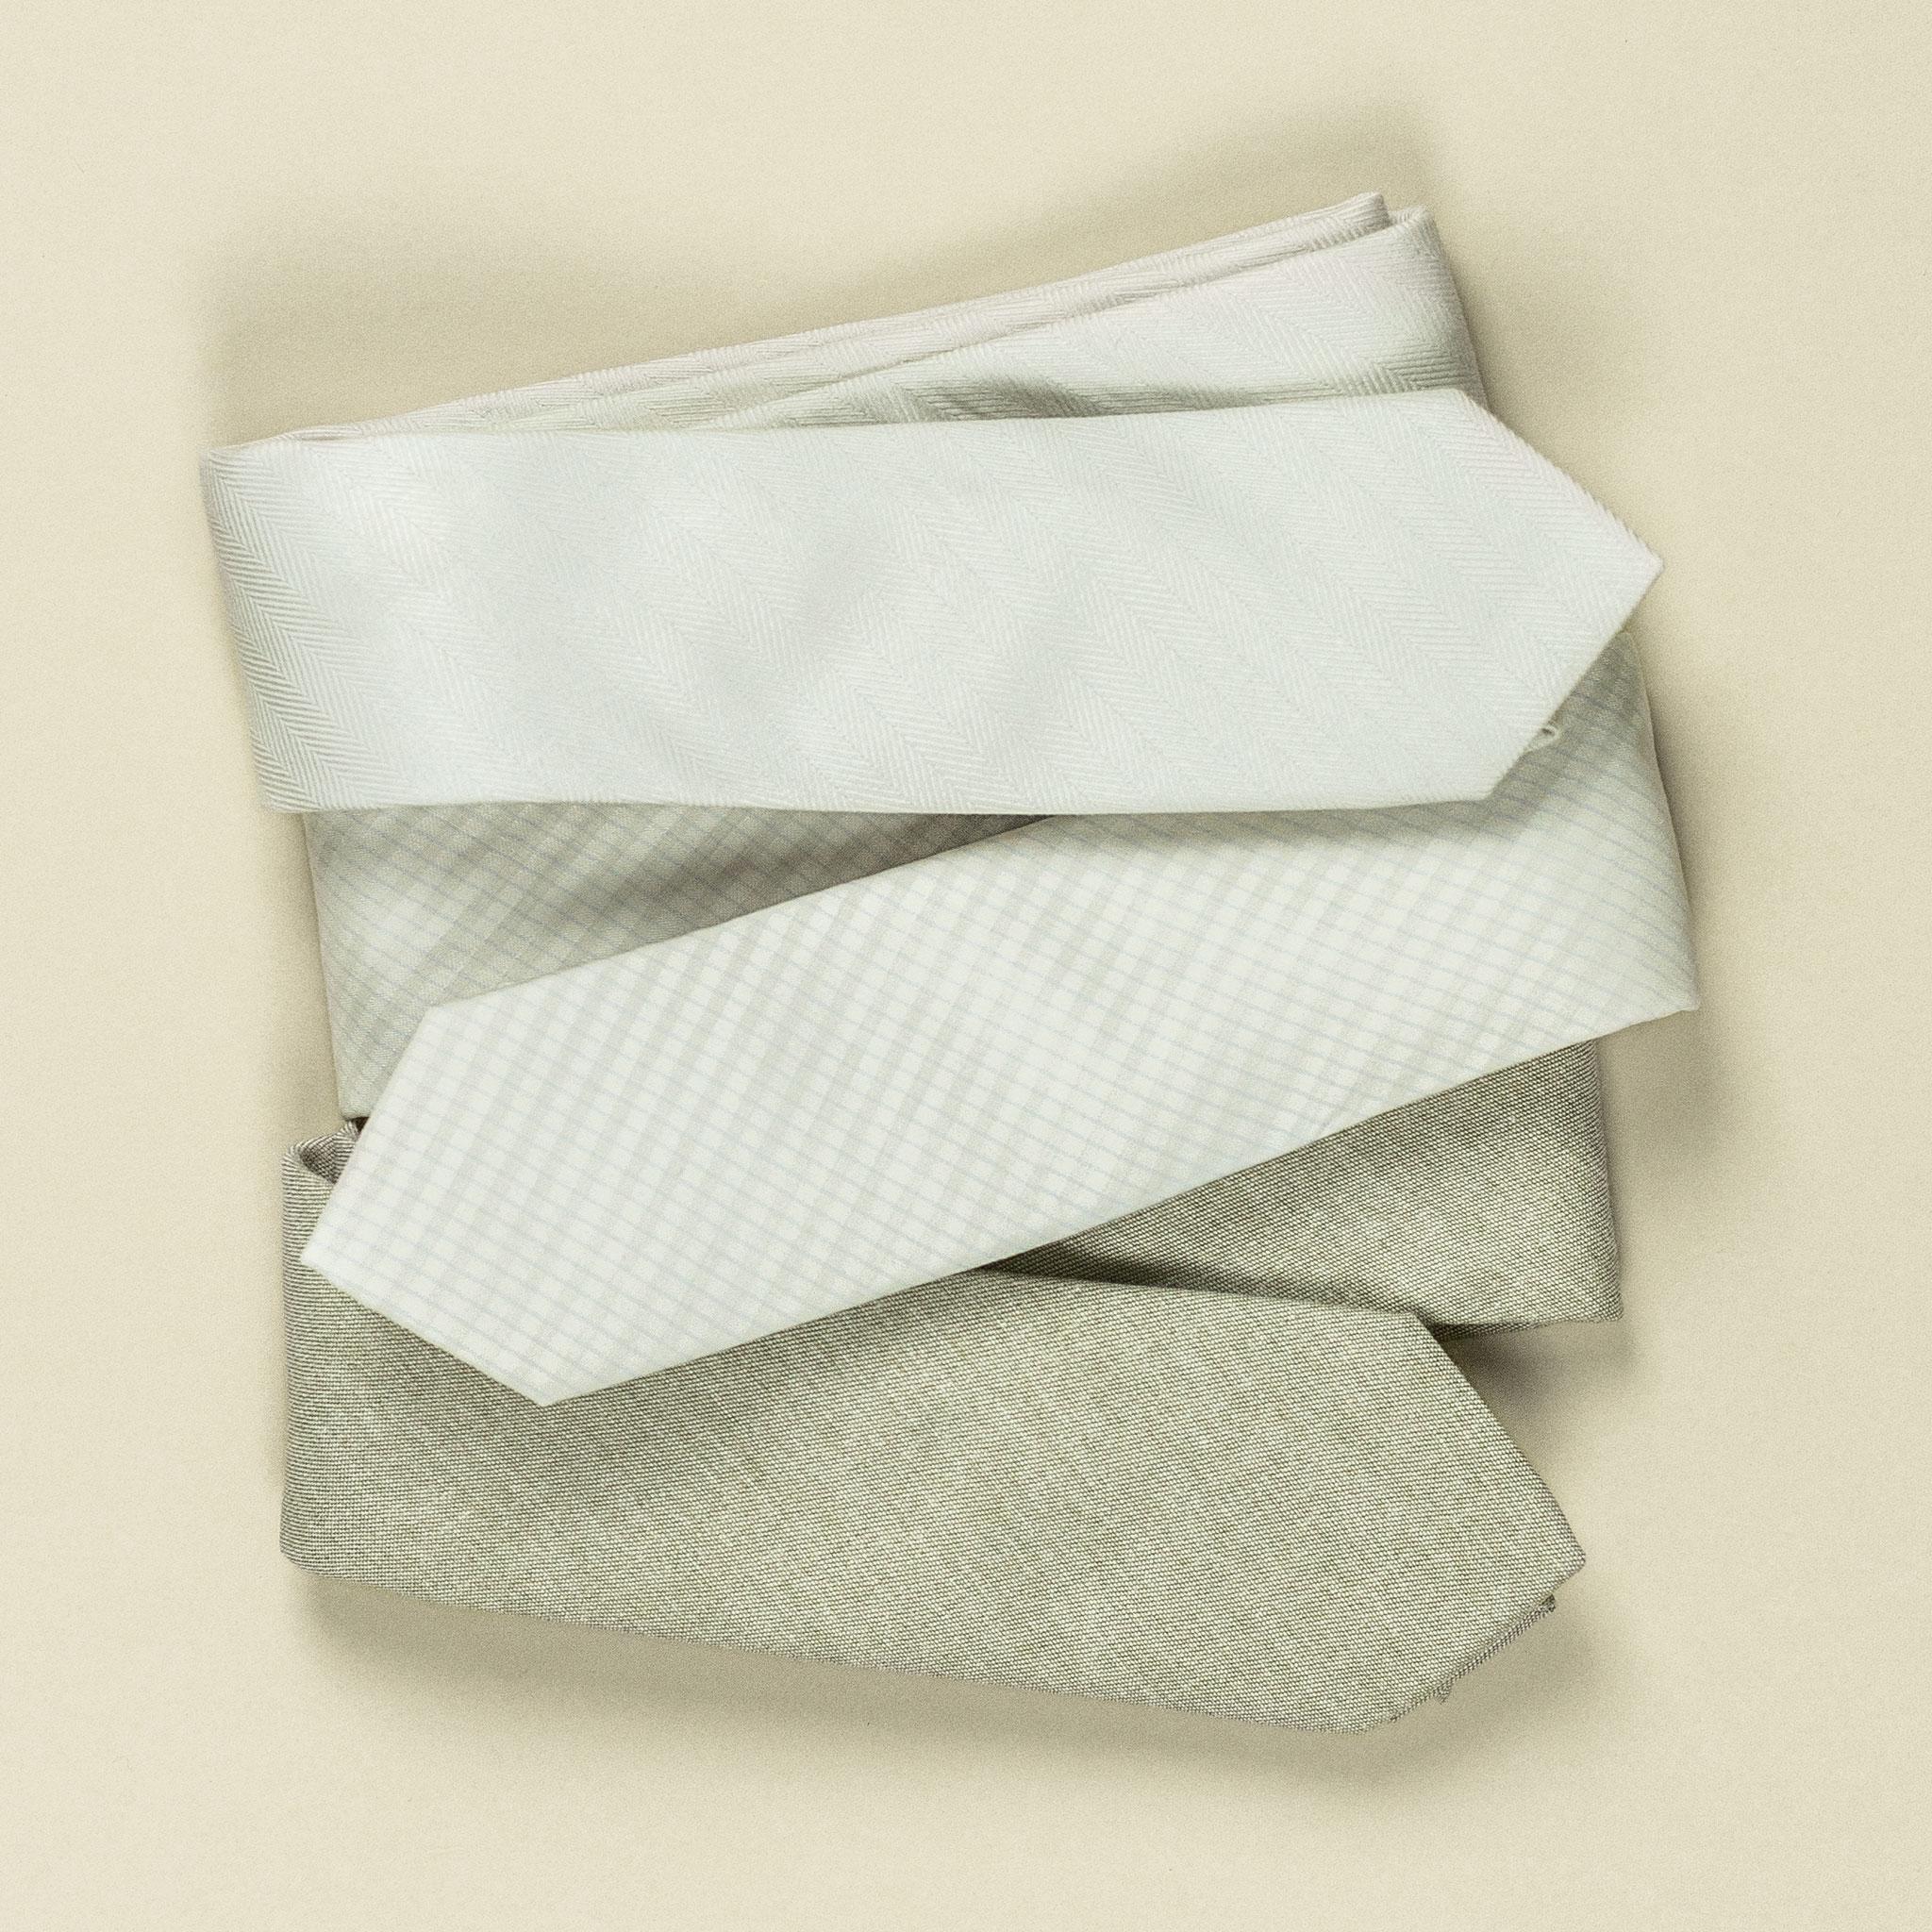 gravatas em tons pastéis